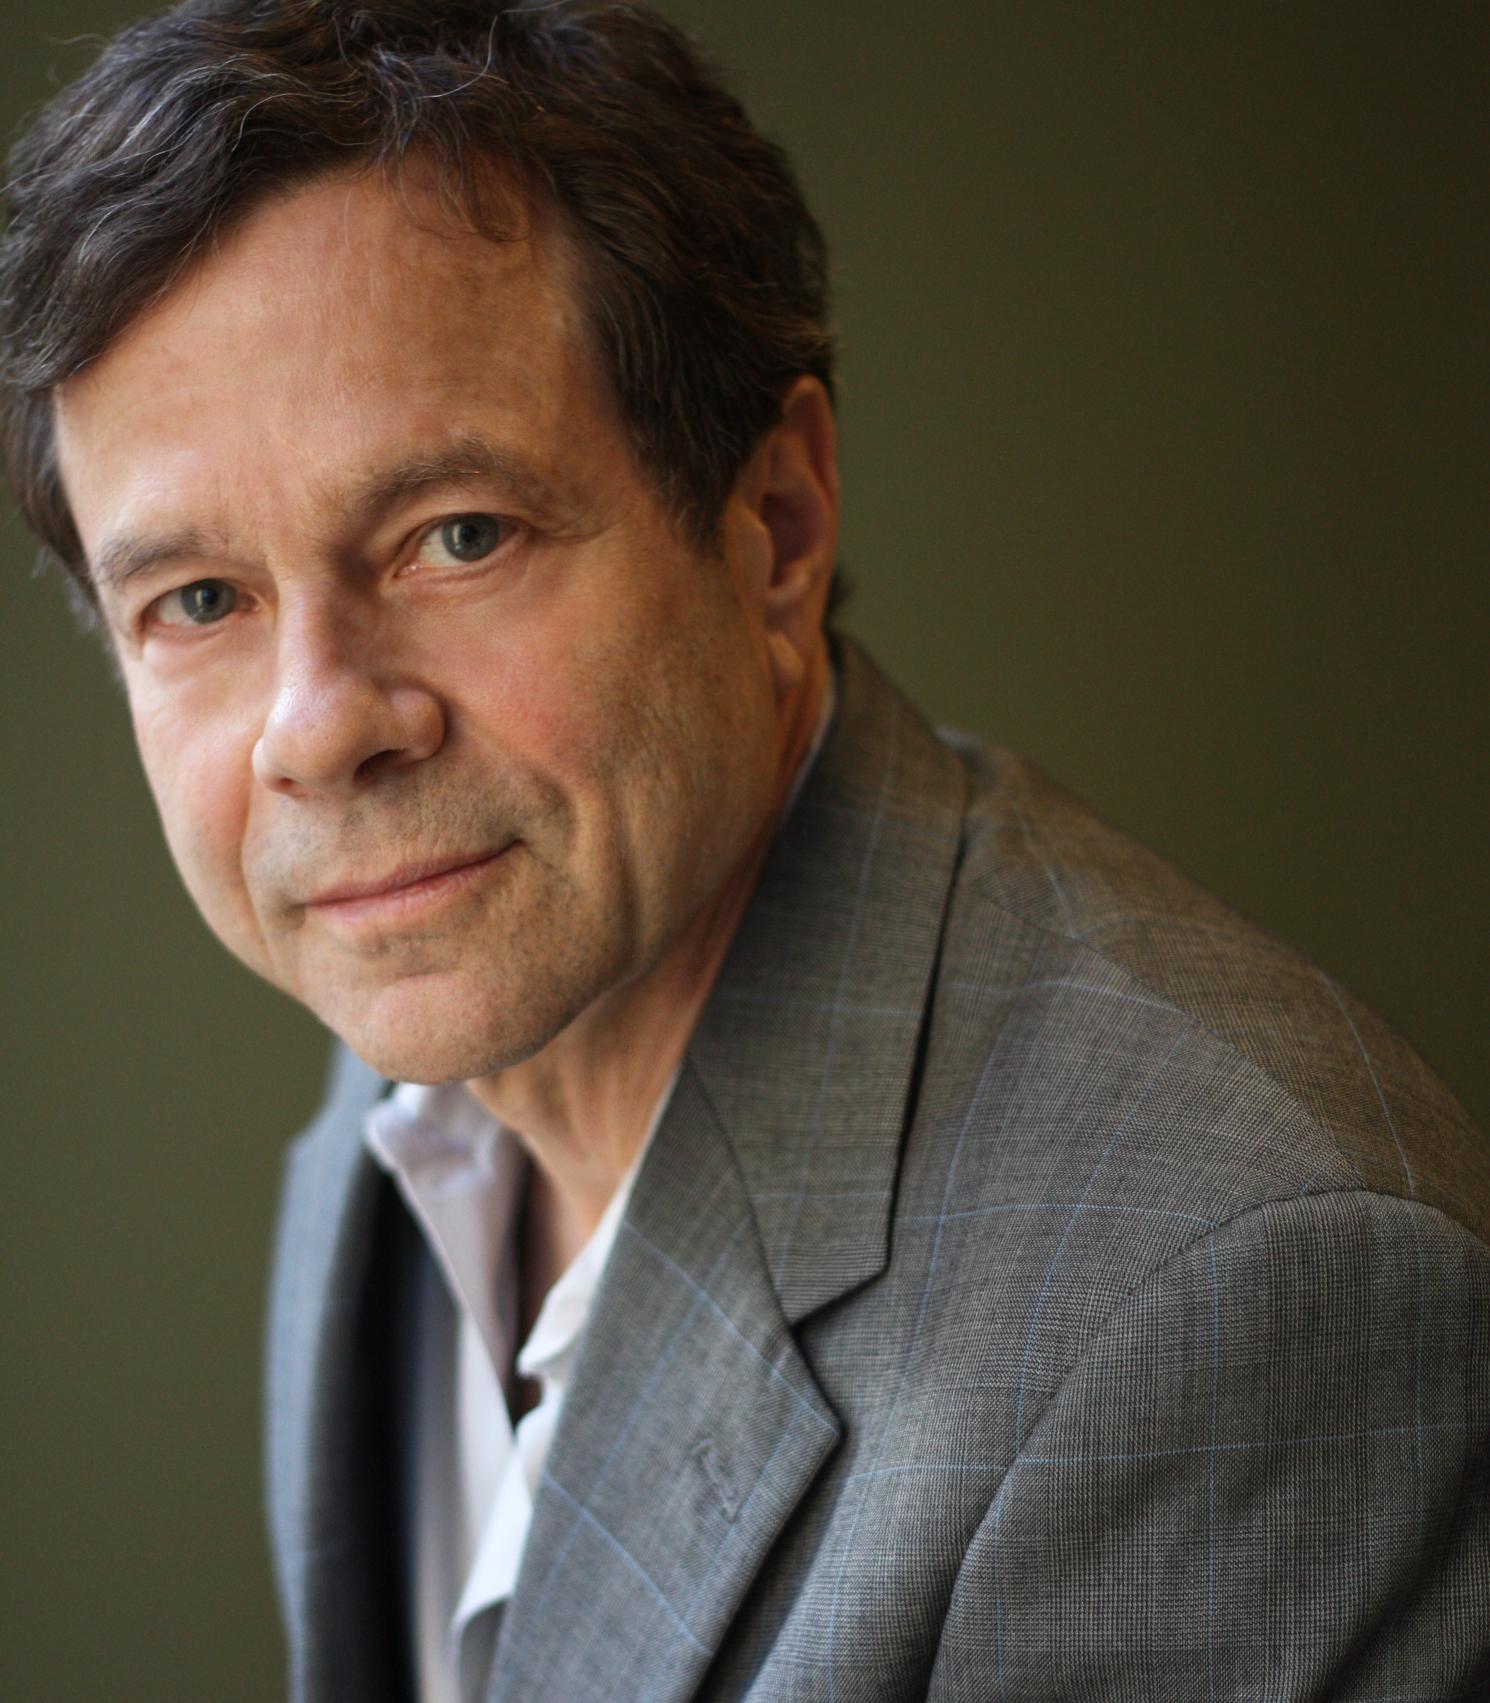 TED Book author: Alan Lightman